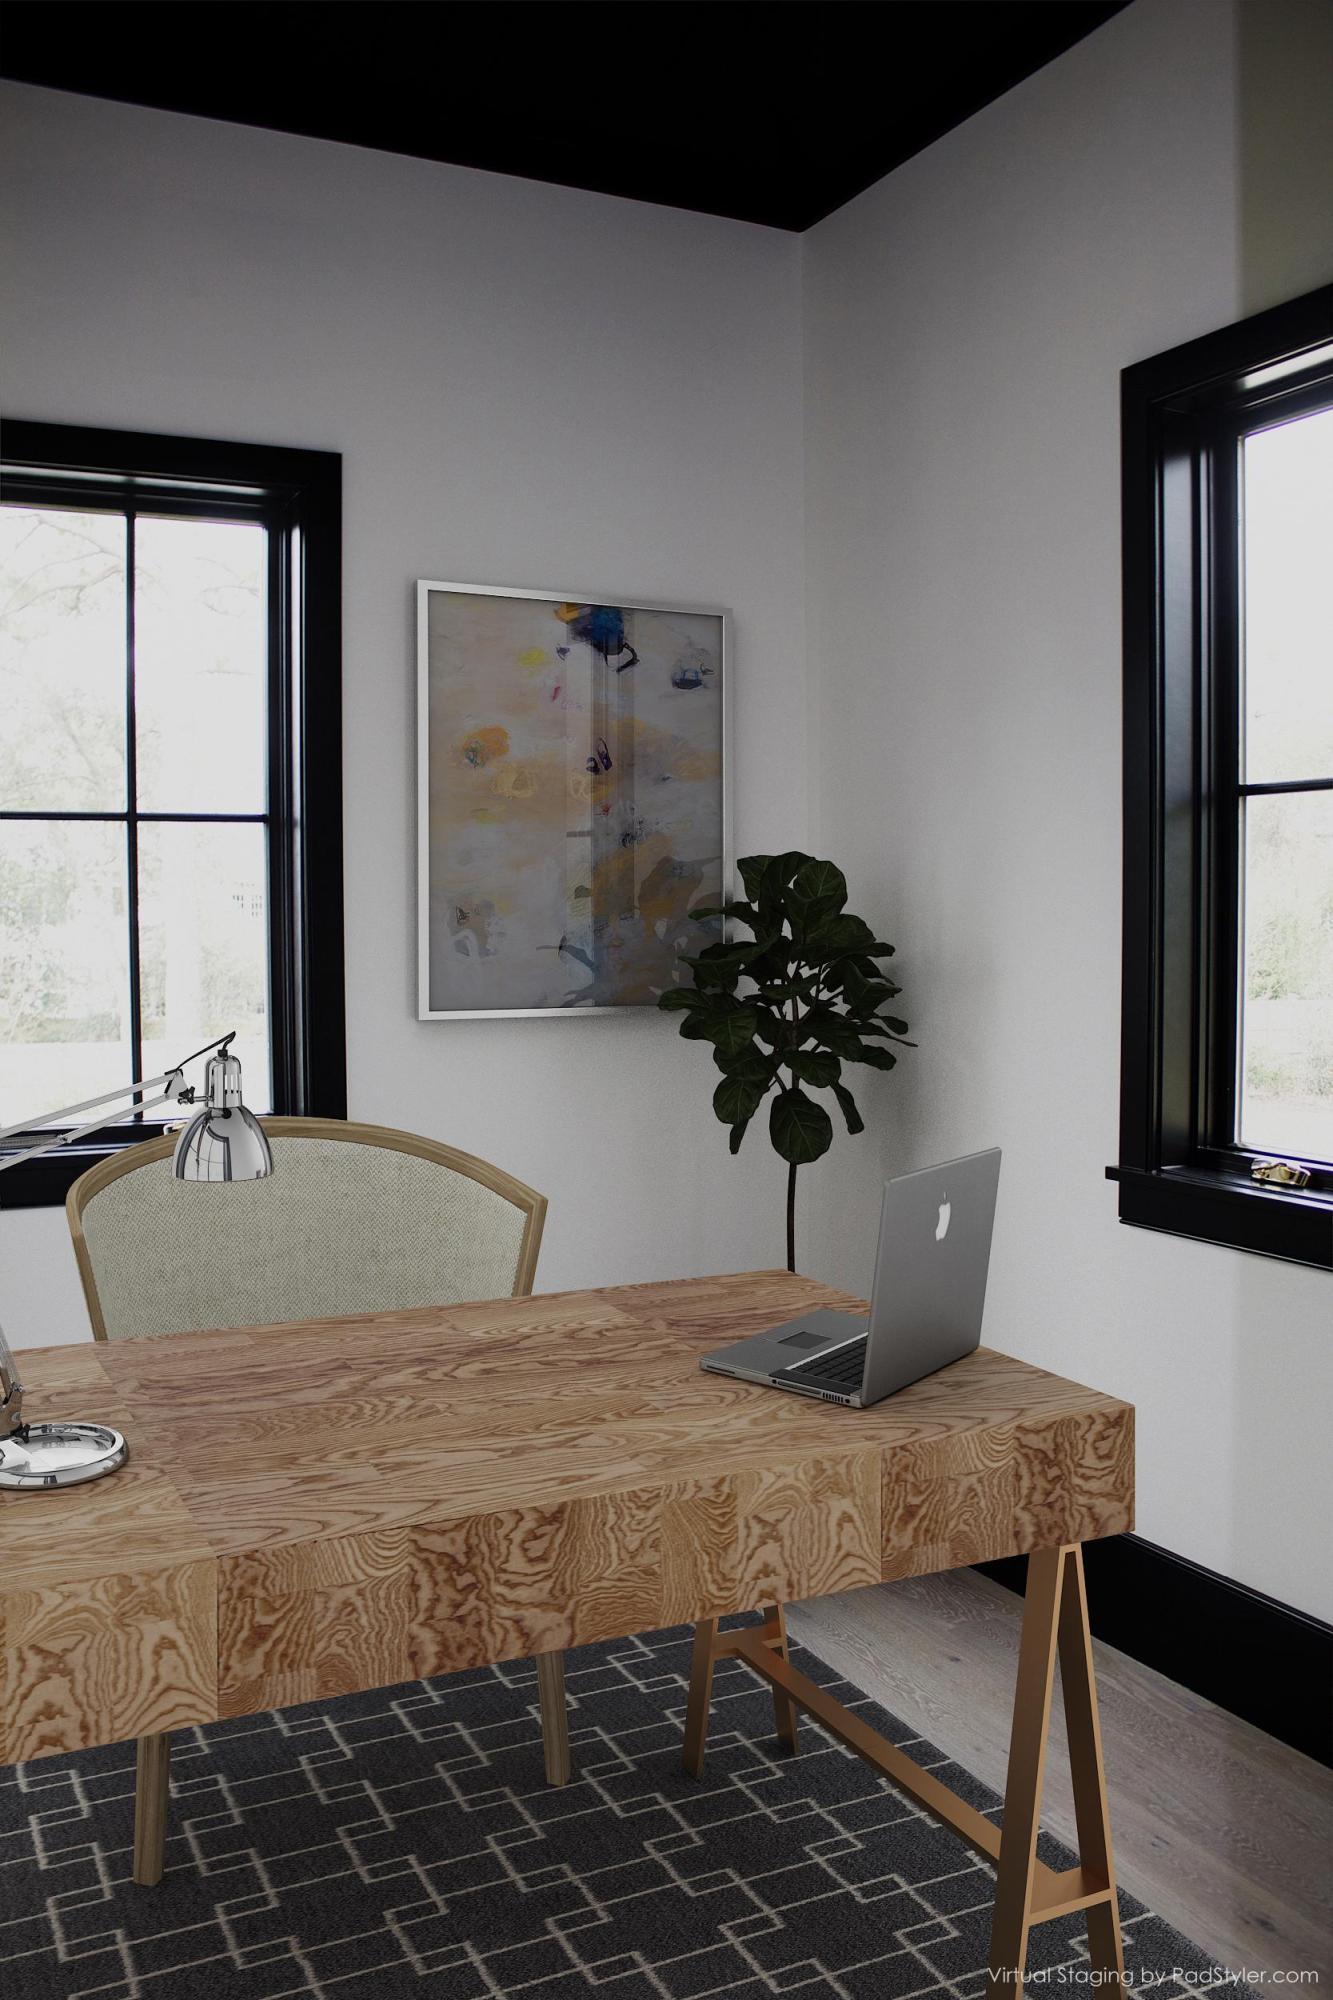 Mathis Ferry Court Homes For Sale - 1206 Clonmel, Mount Pleasant, SC - 17